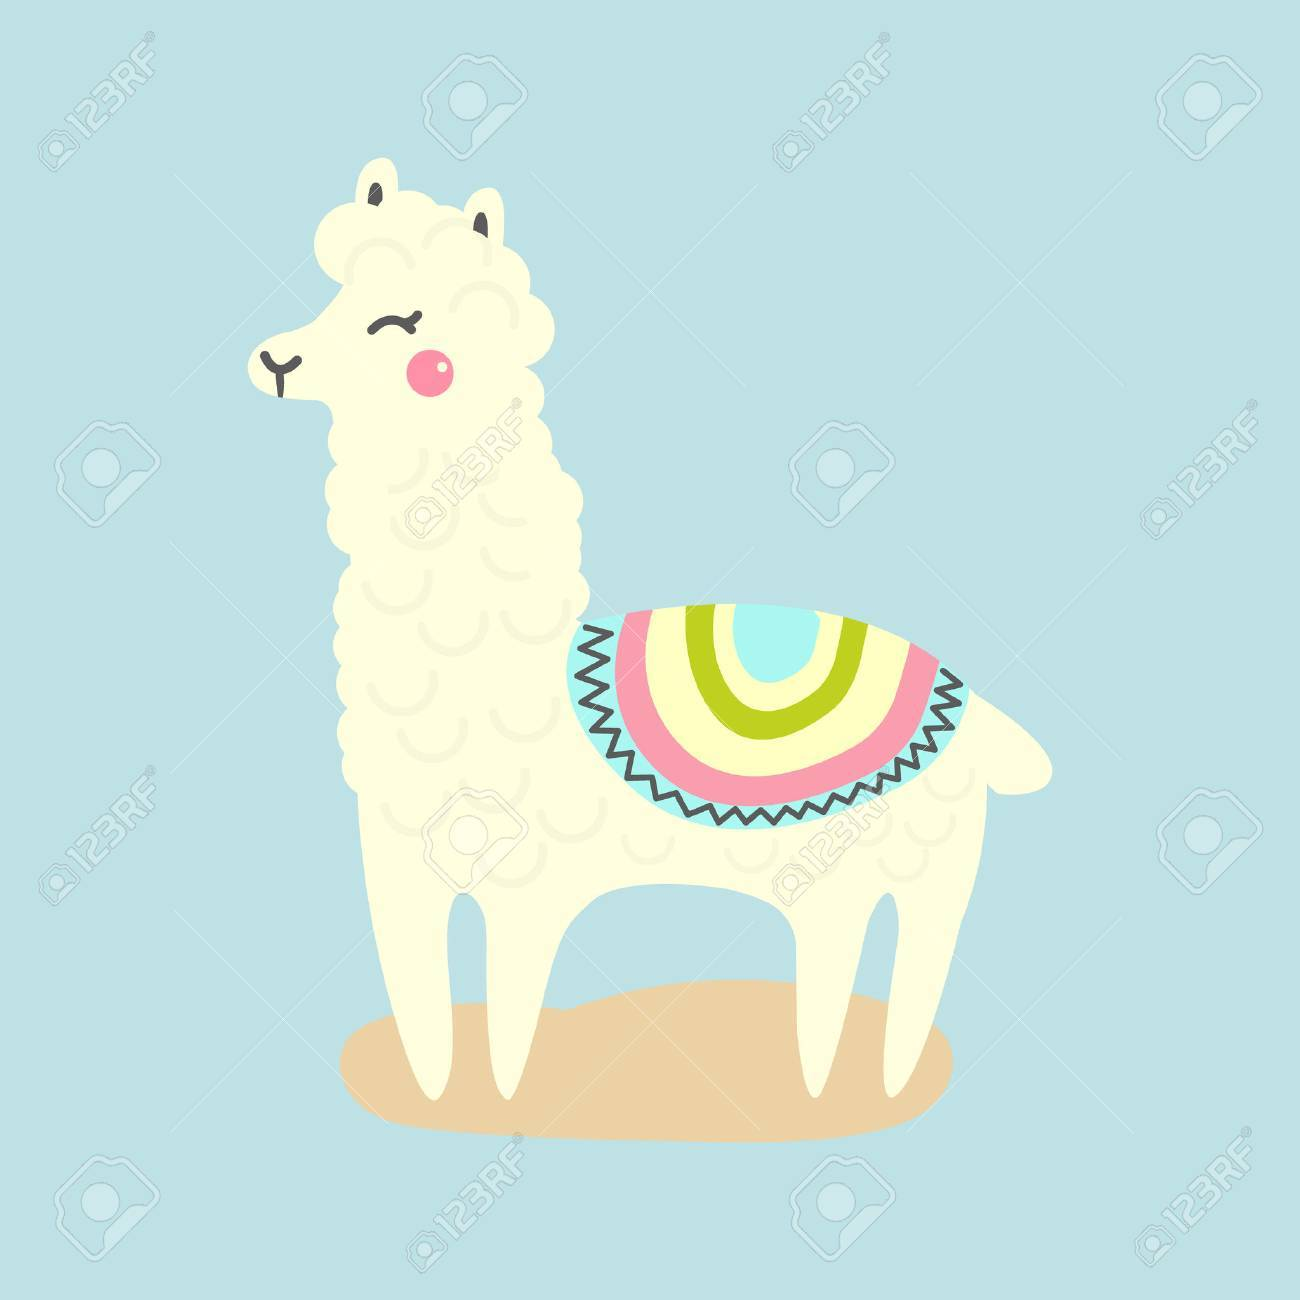 hight resolution of vector vector cute llama or alpaca illustration funny animal